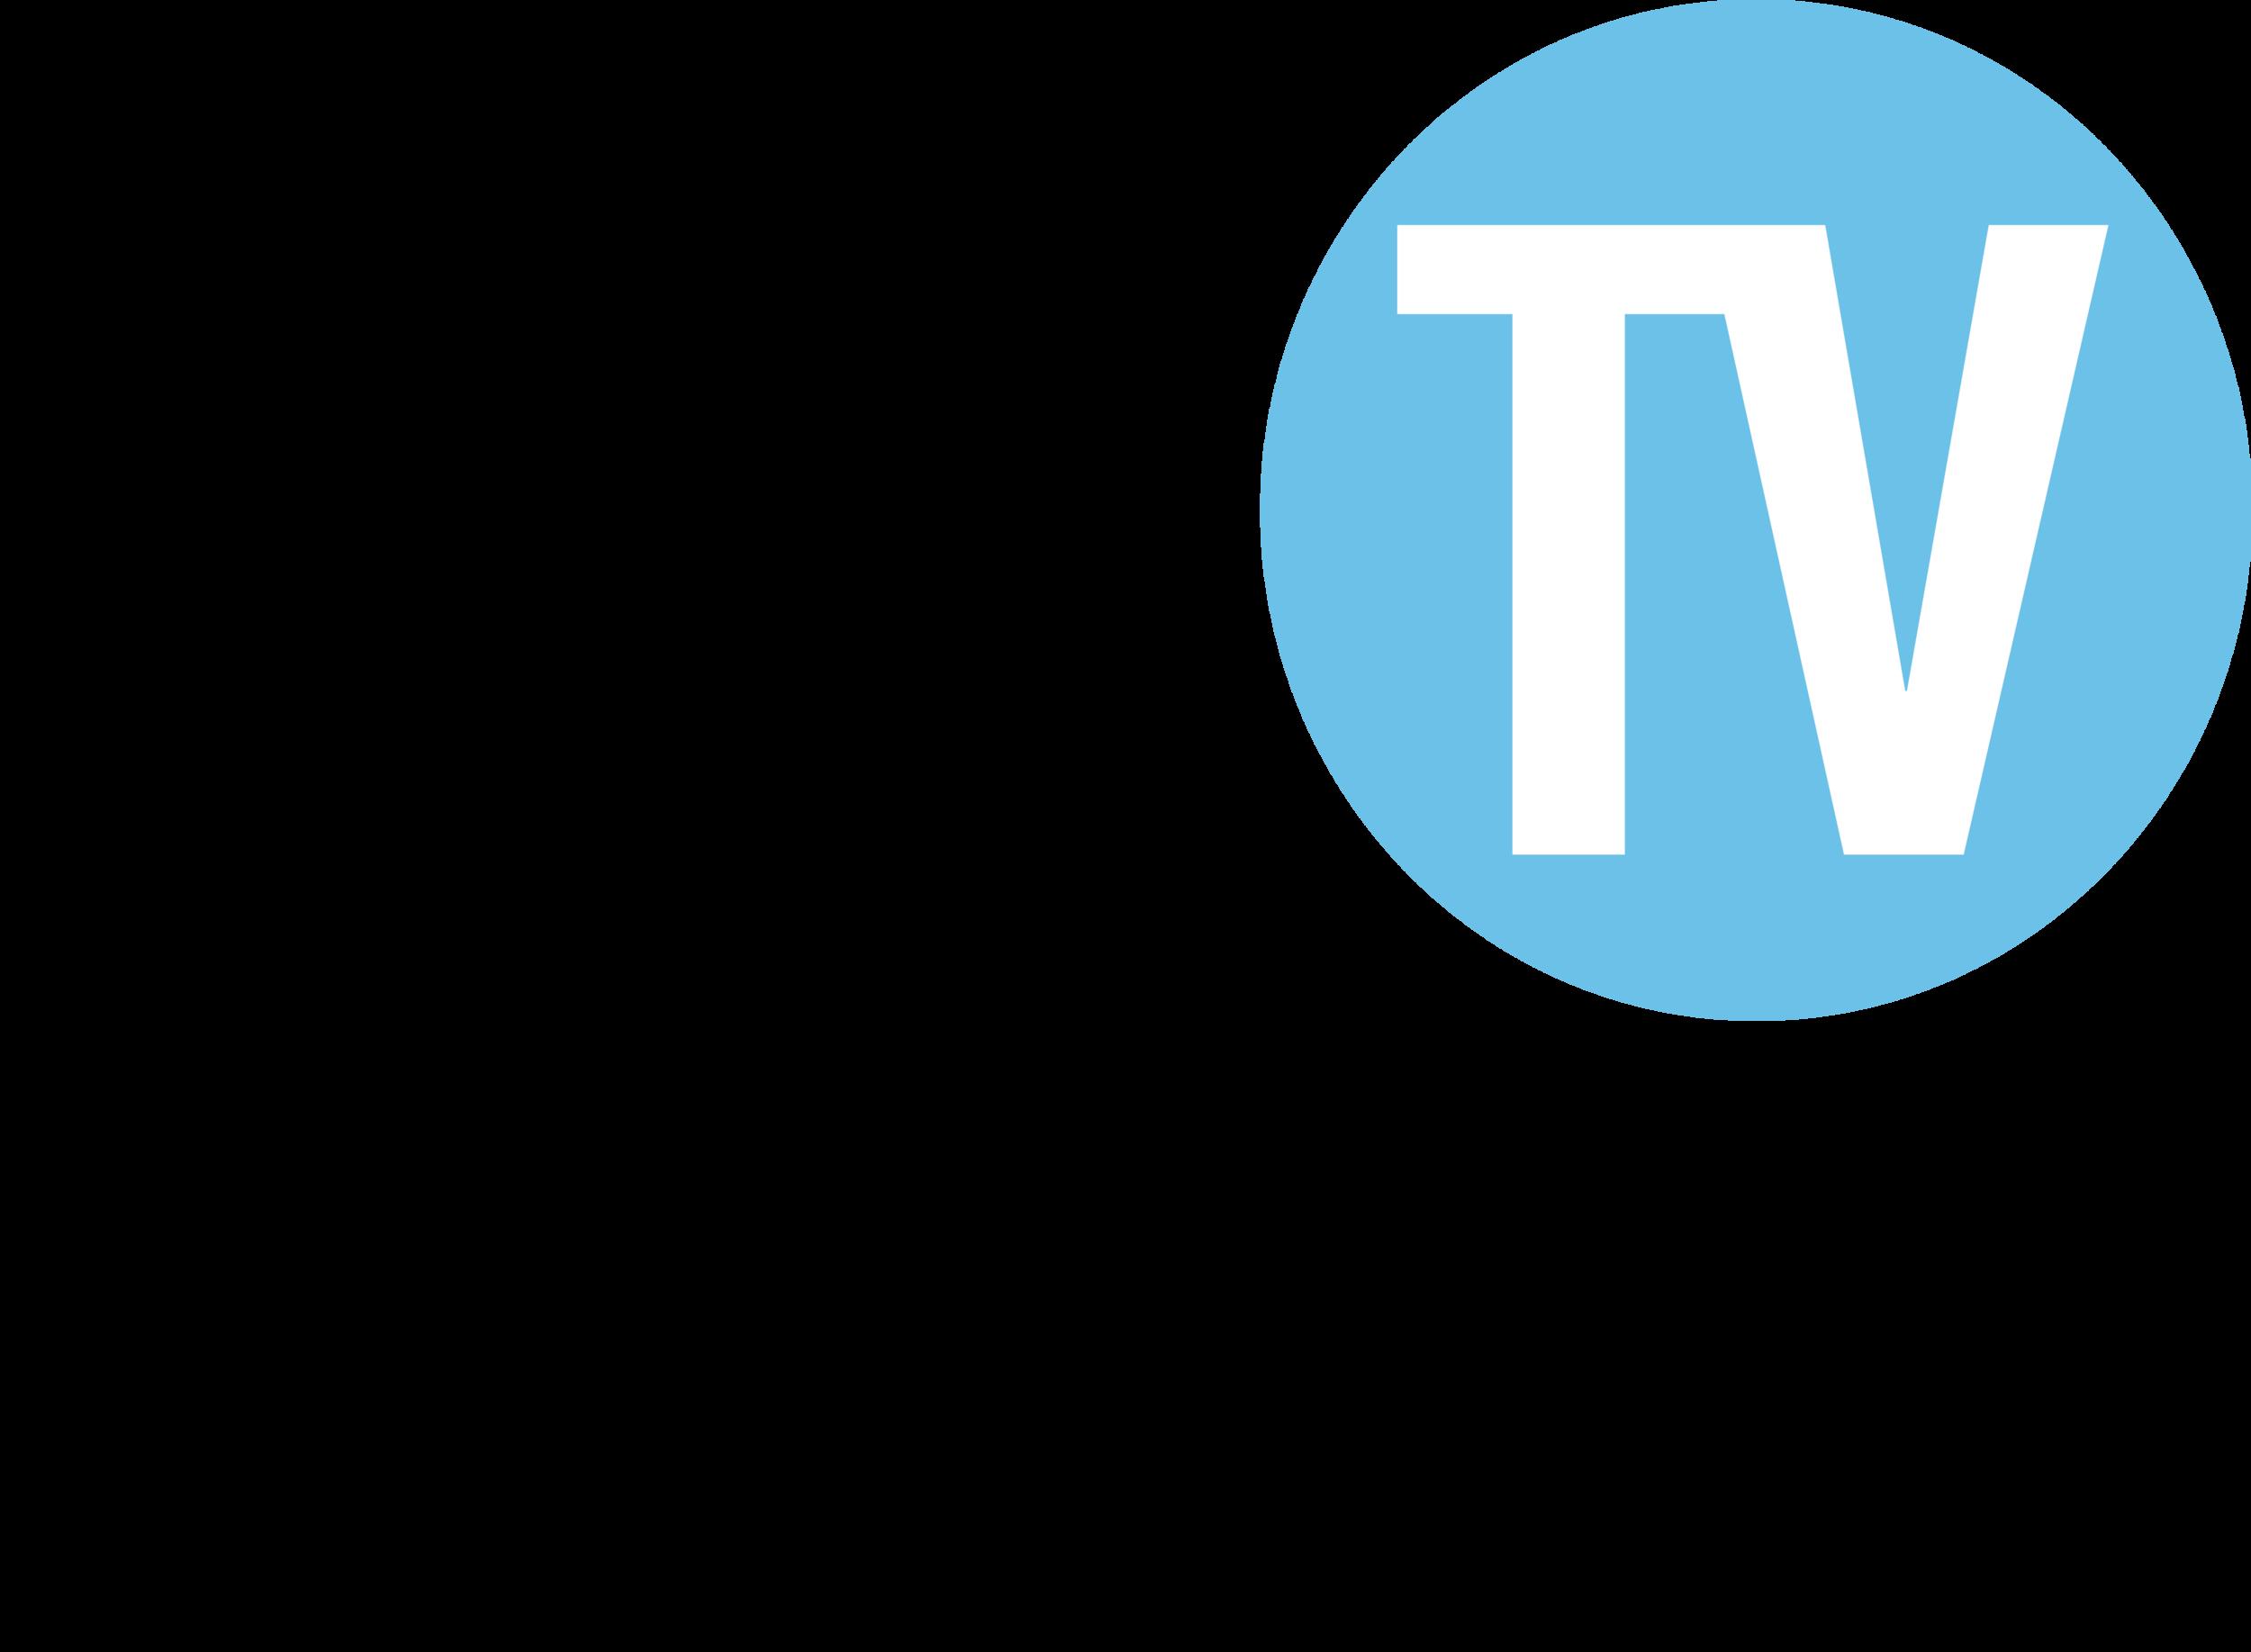 TTVJ_Logo.png